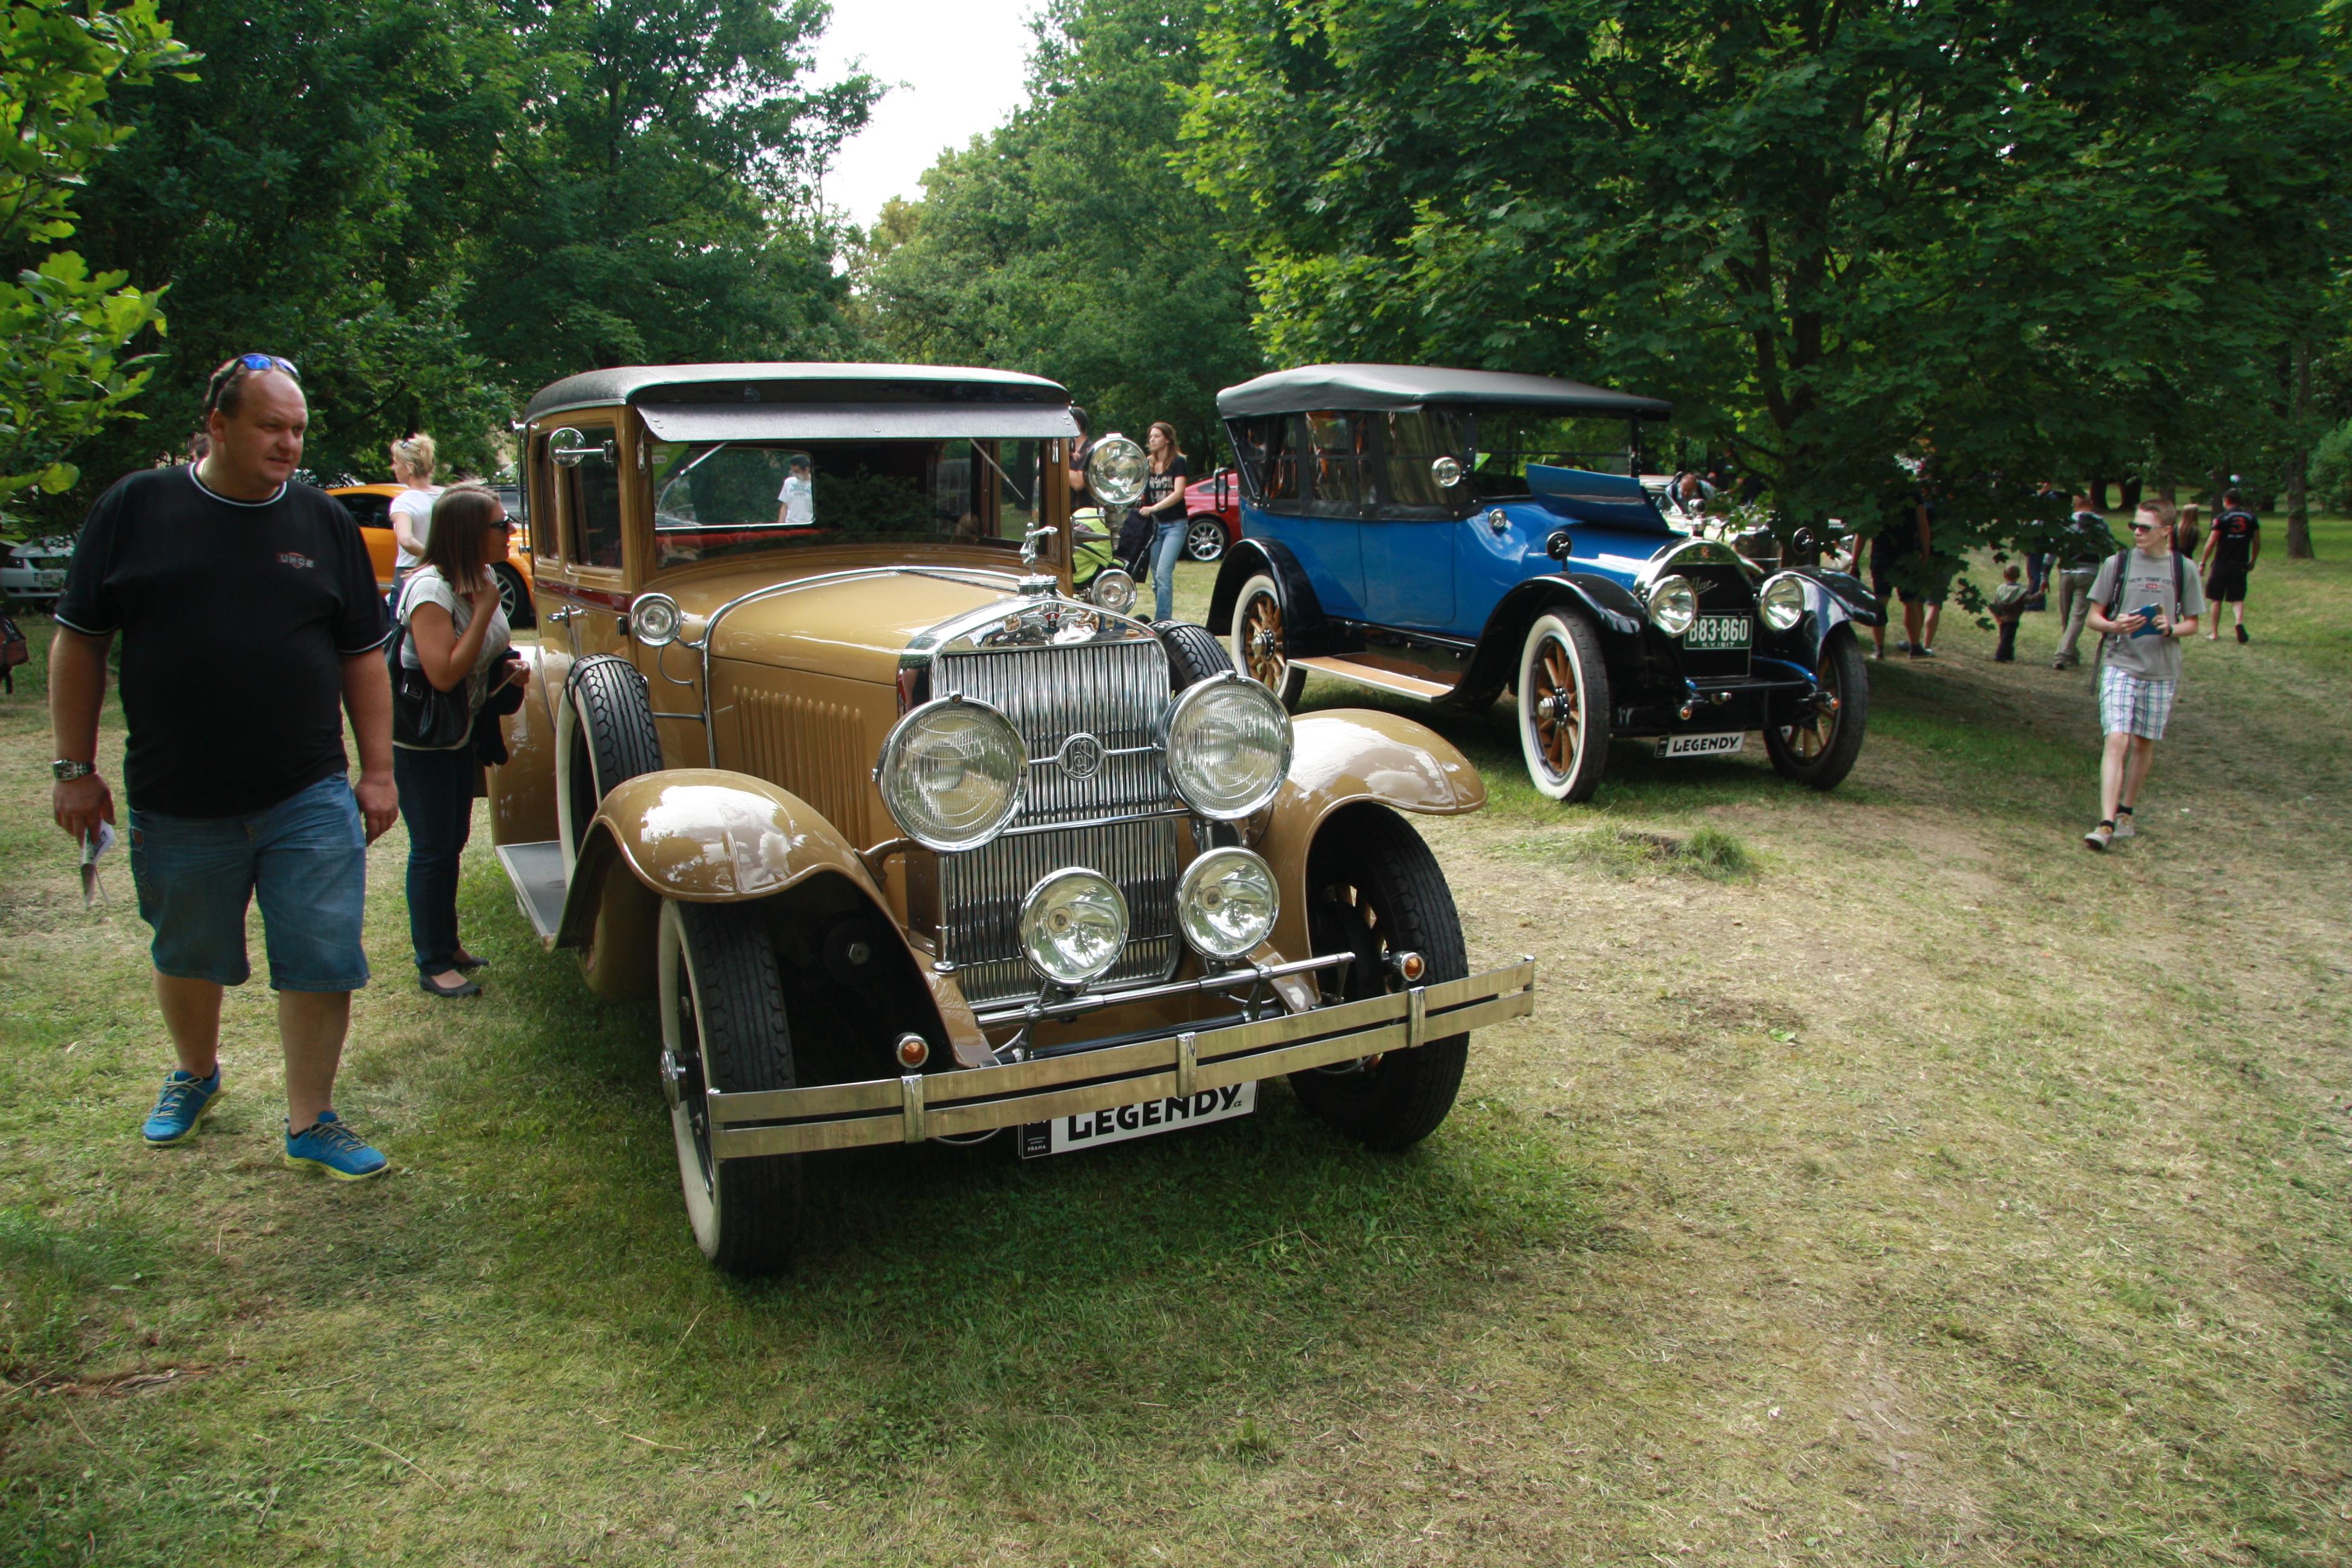 File Cadillac Suburban 2 at Legendy 2014 JPG Wikimedia